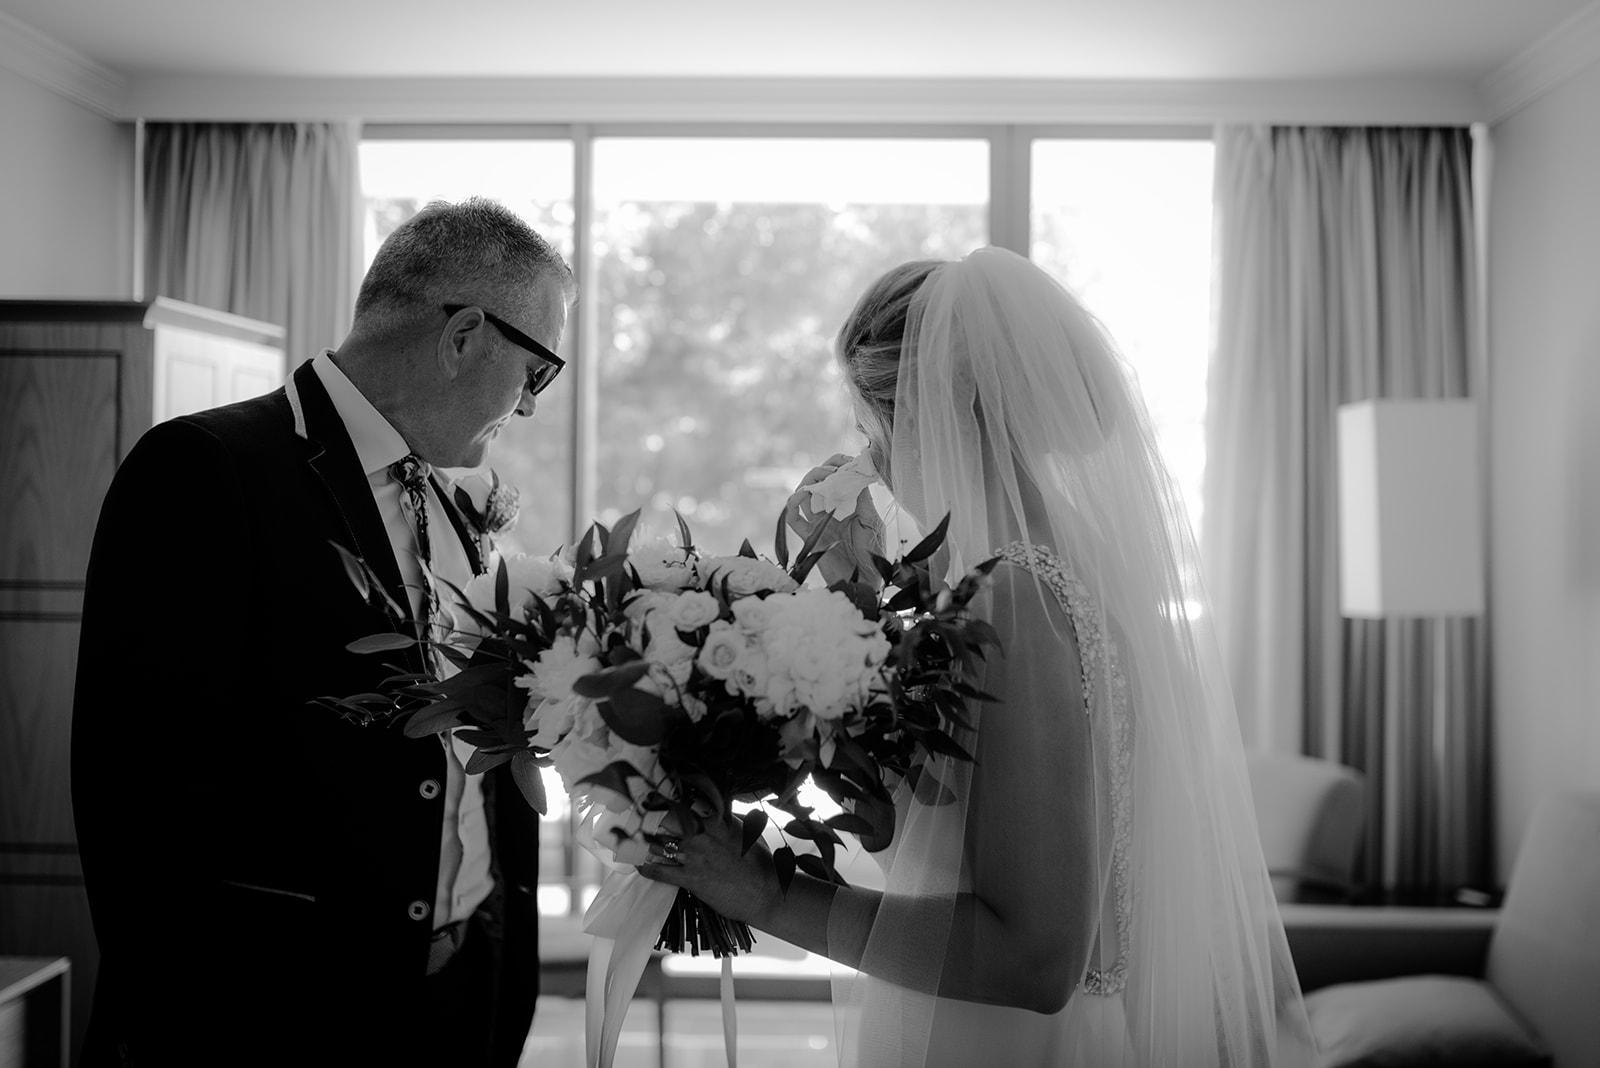 Lapela-photography-wedding-algarve-portugal-best-of-20.jpg